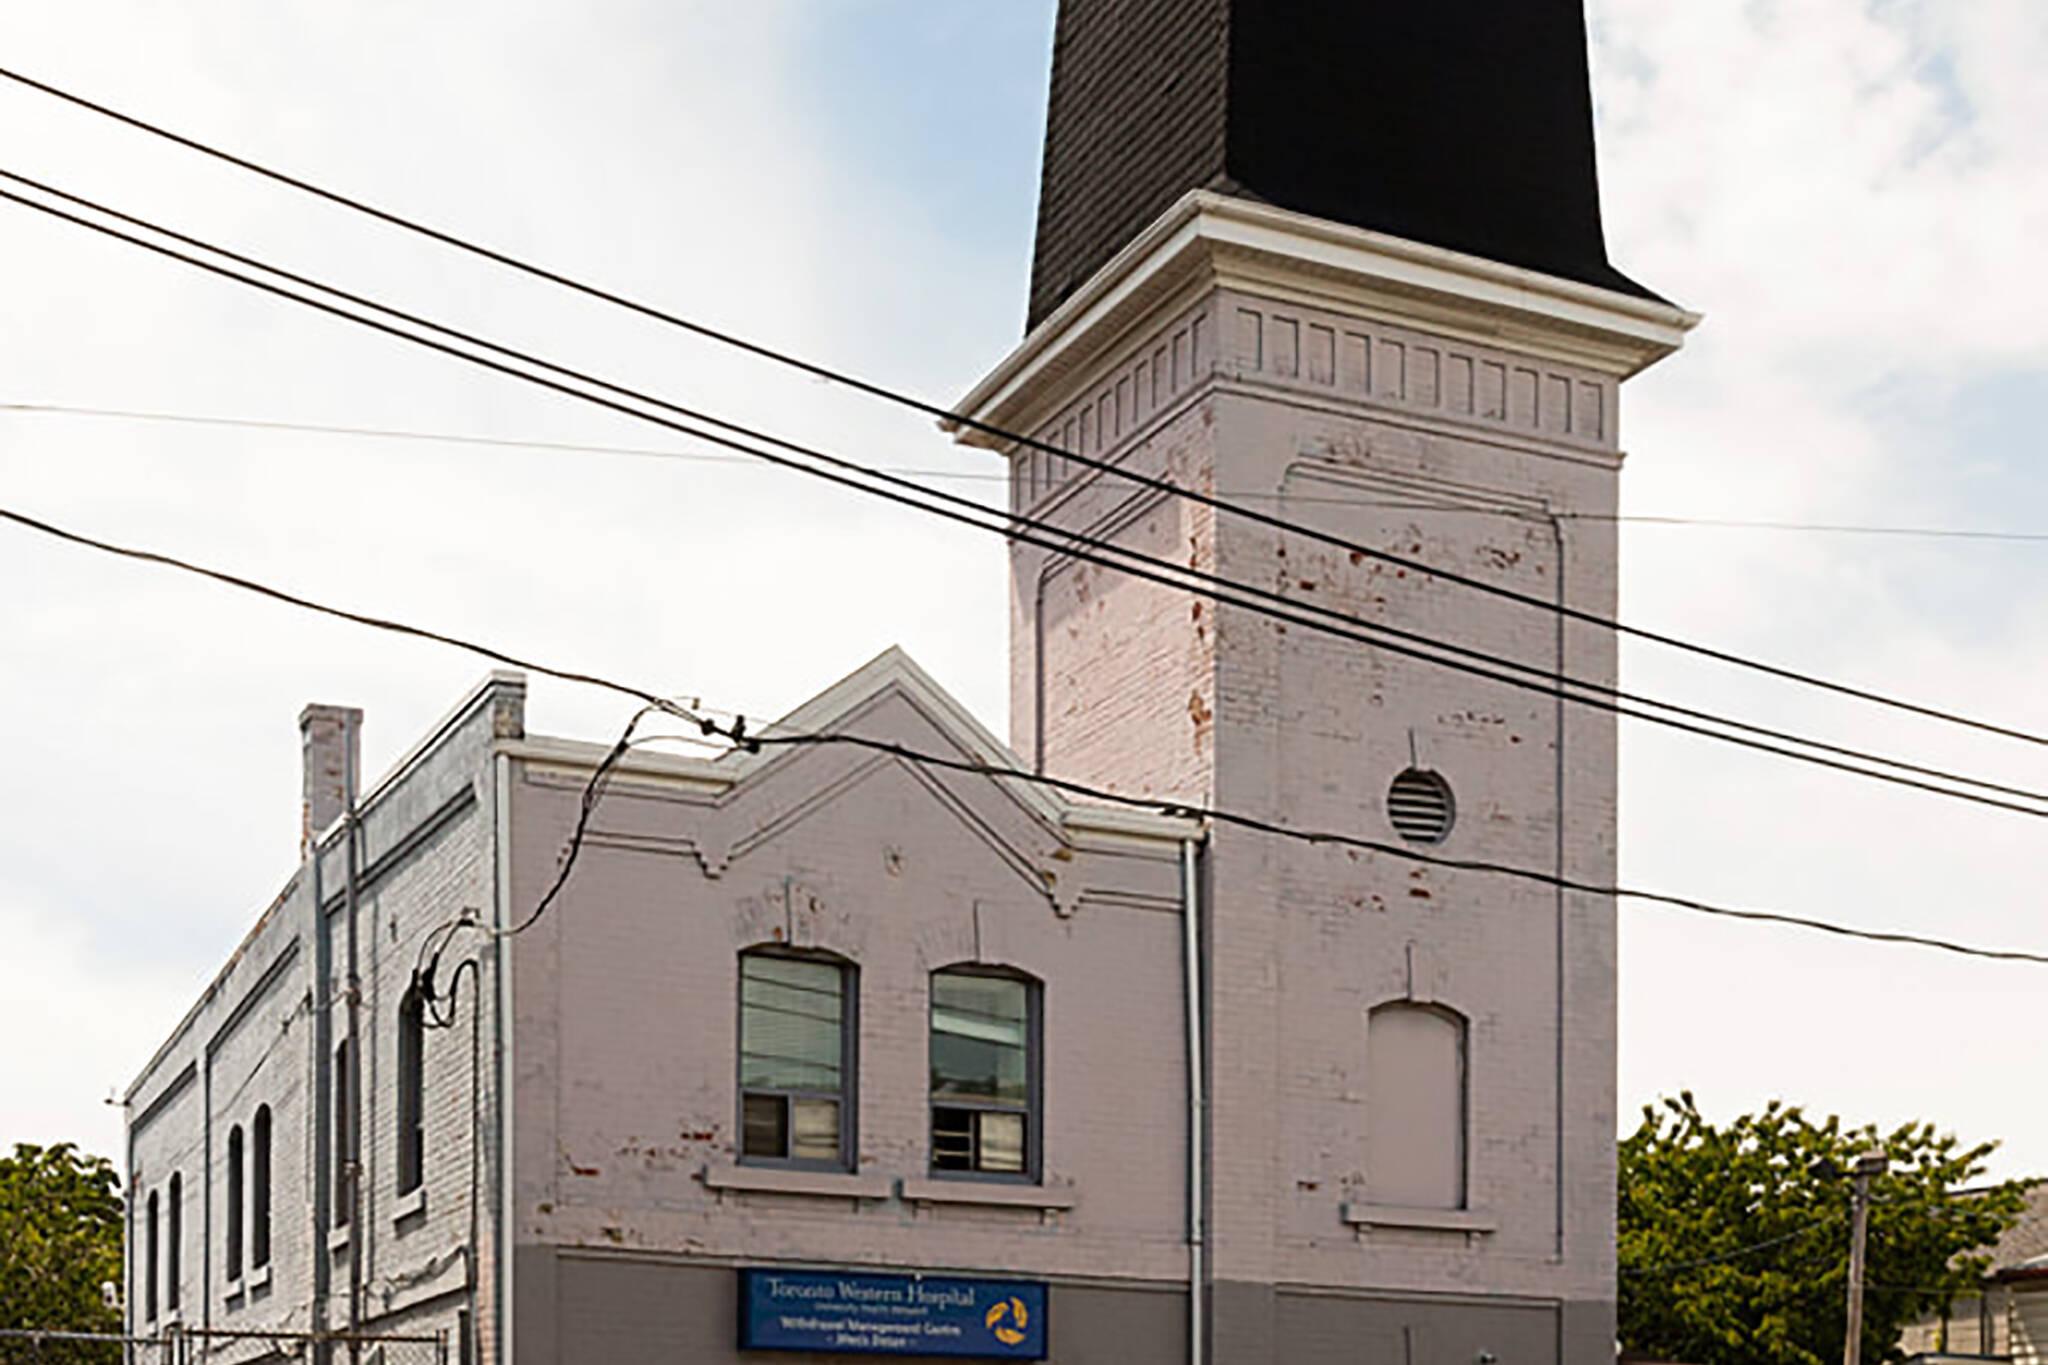 ossington clocktower